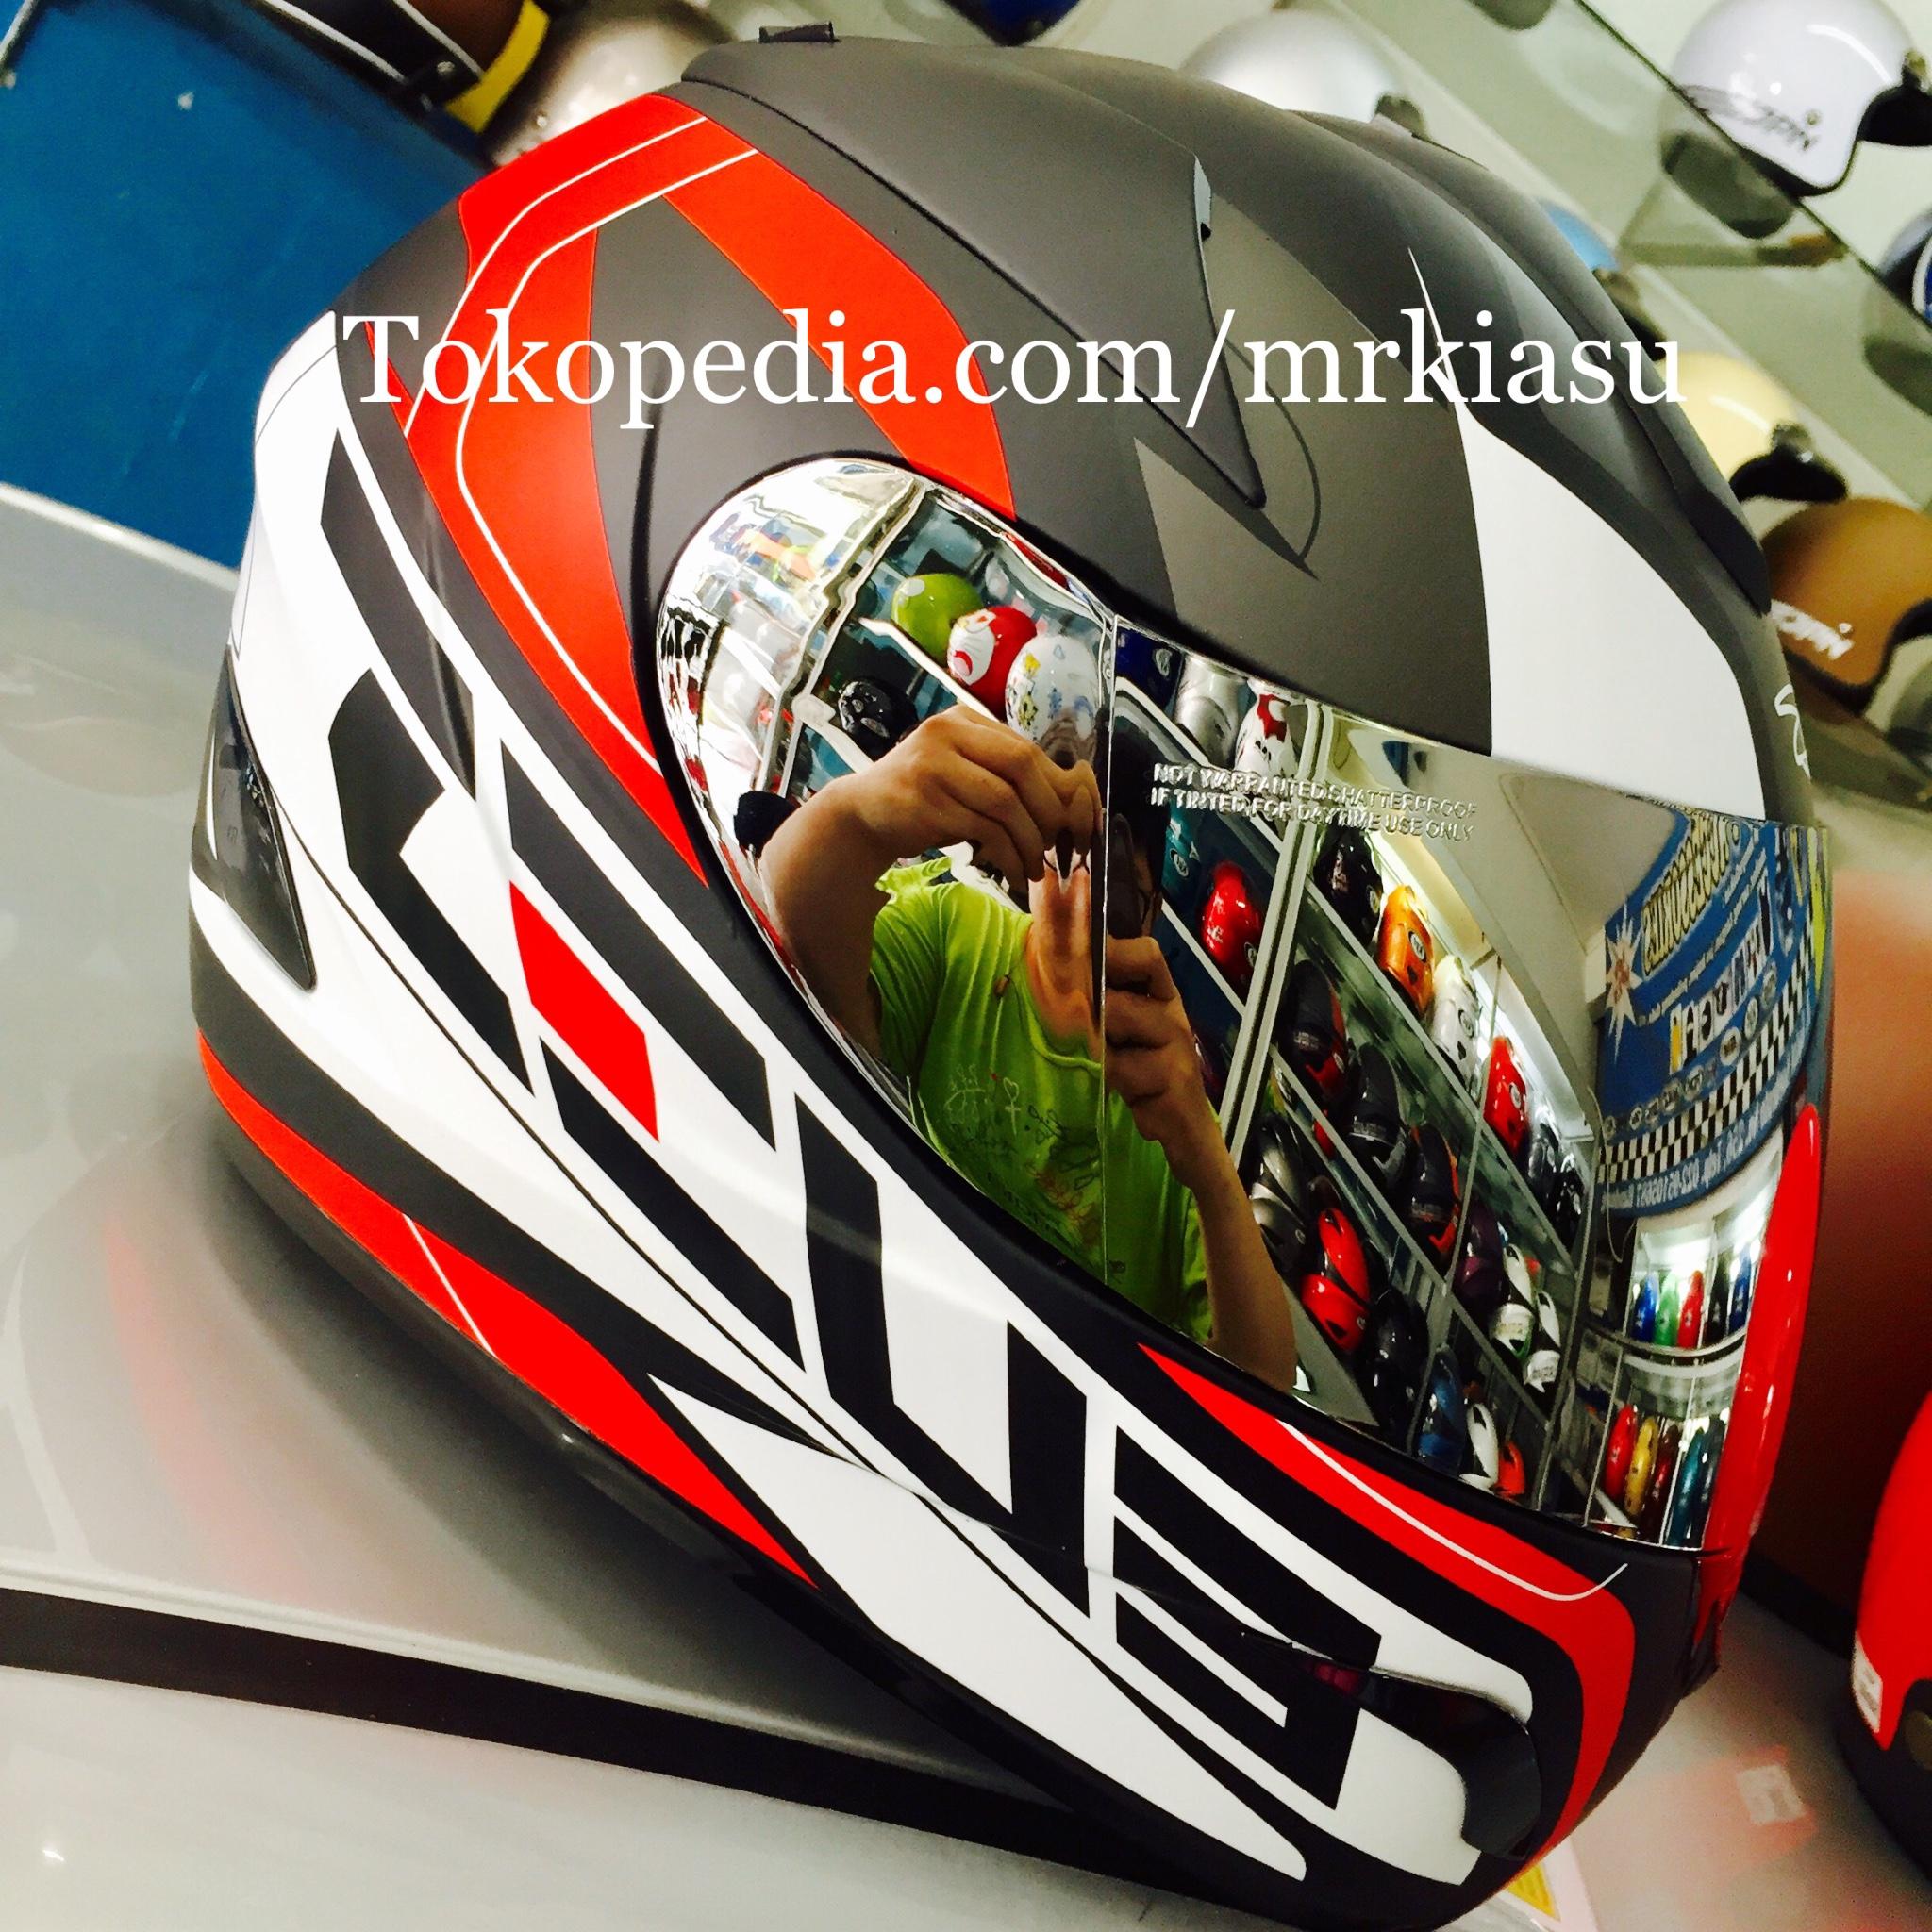 Zeus Helm Fullface 806 Hitam Doff Daftar Harga Terlengkap Zs811 Black Al12 Red Review Z Import Udah Double Visor